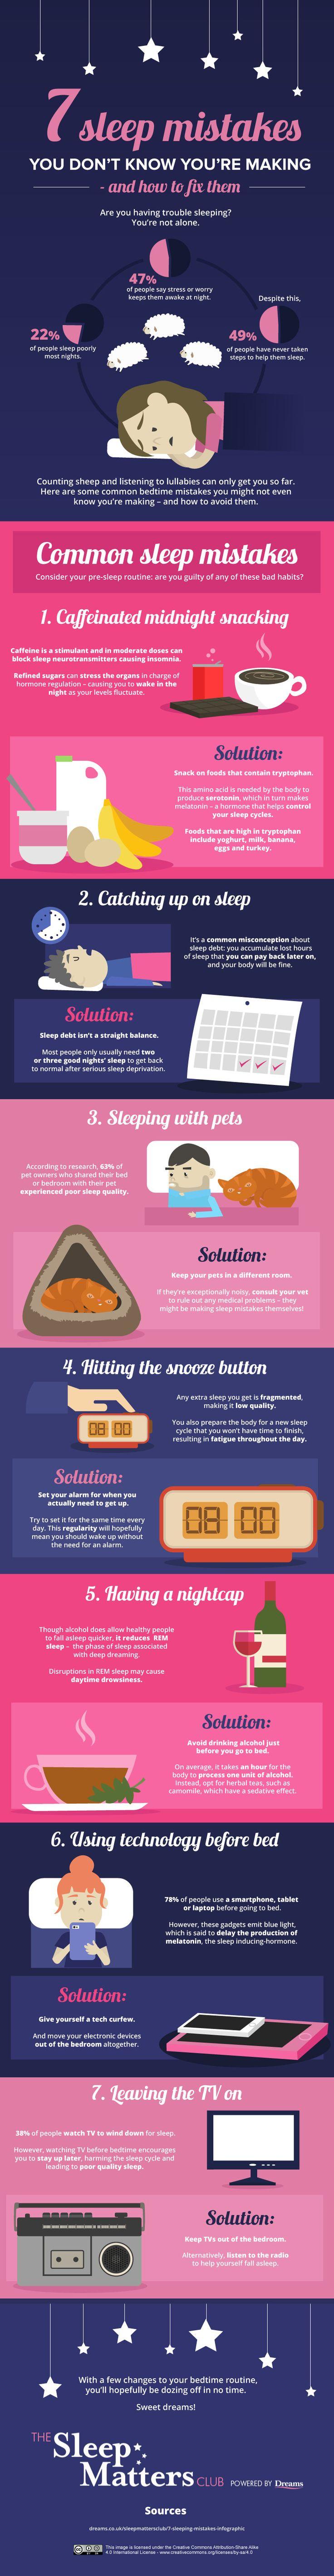 7 sleep mistakes